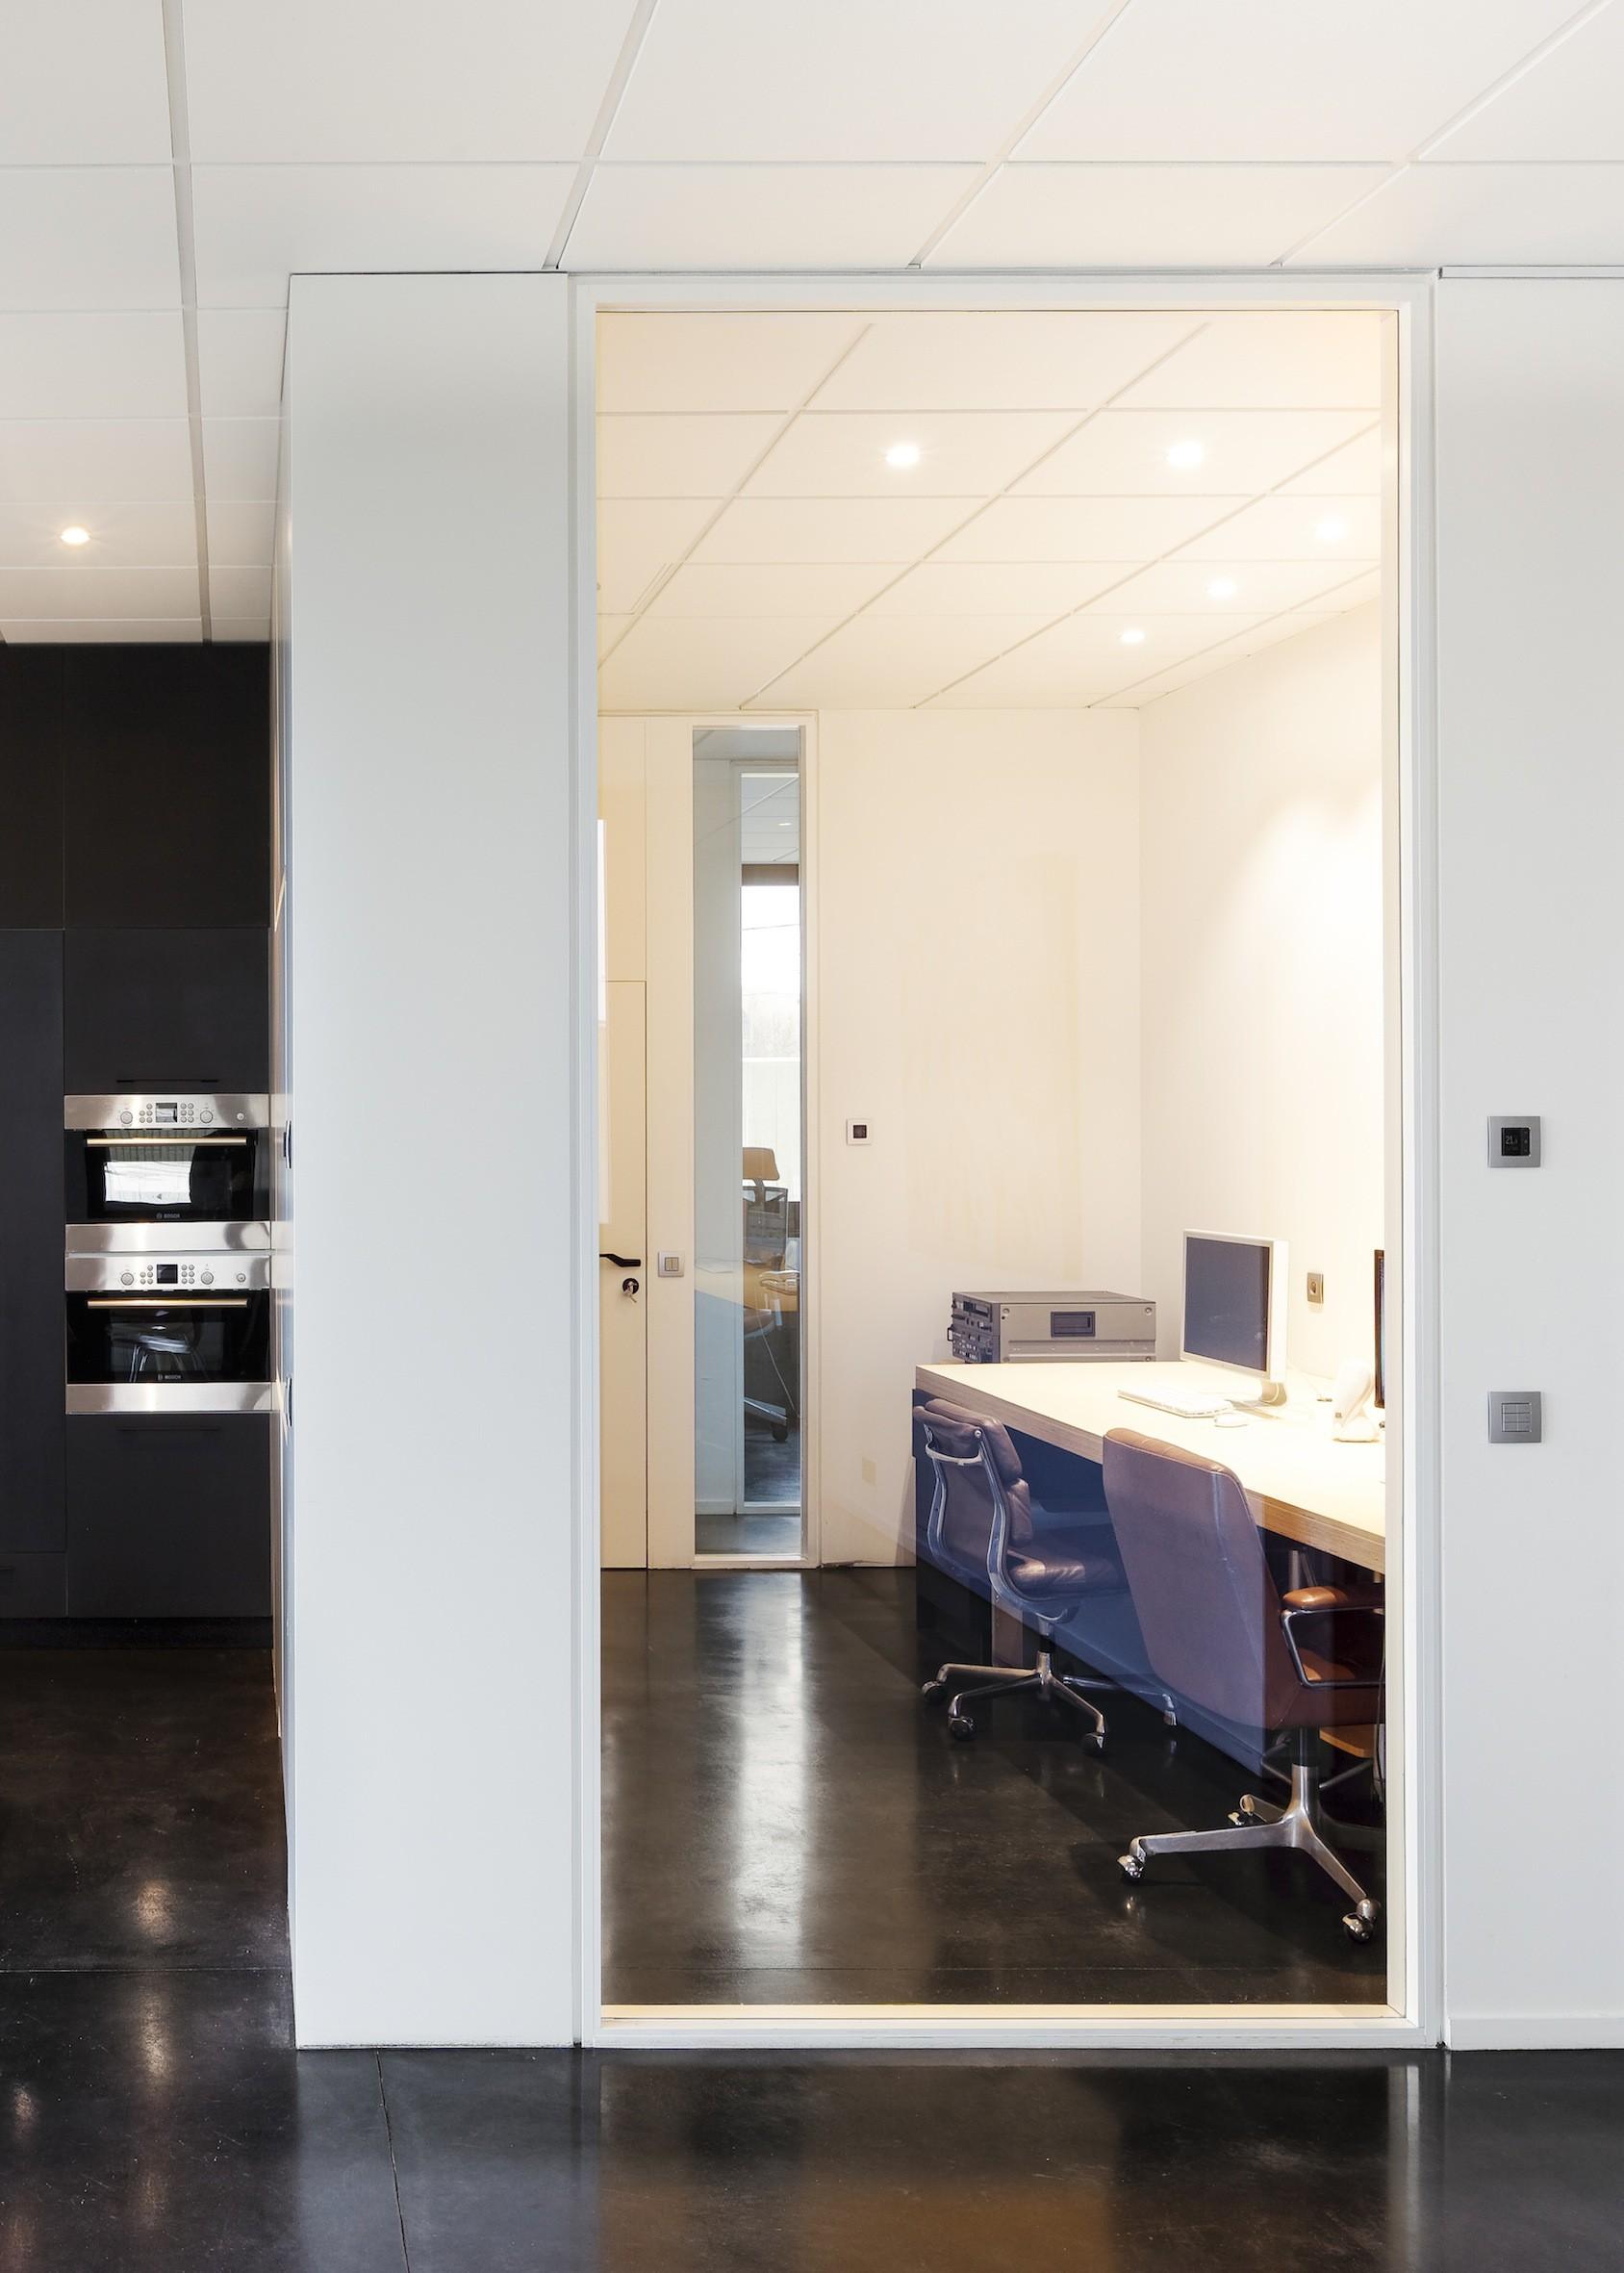 Snark Office / calimùcho